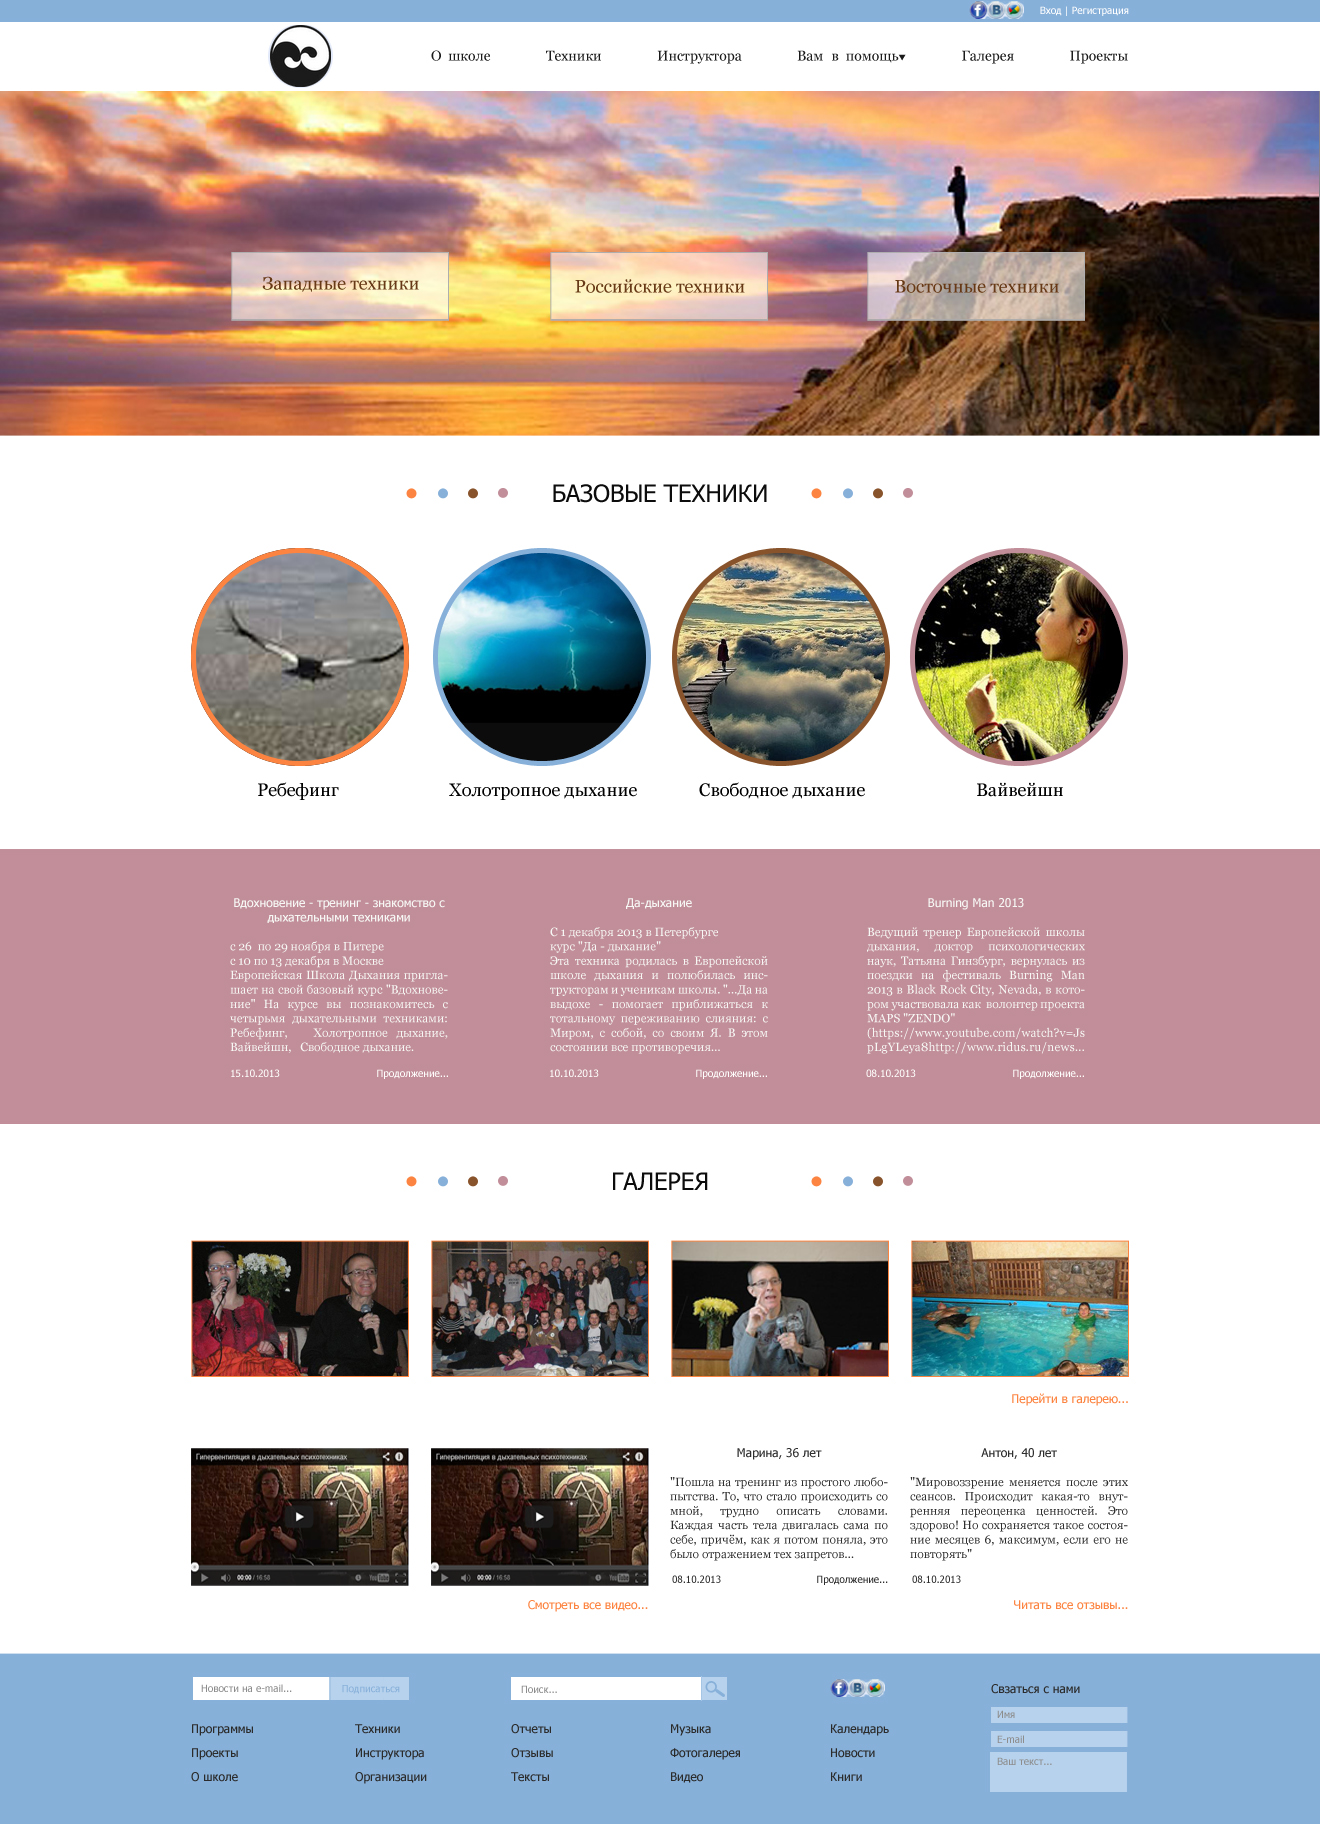 Креативный дизайн главной страницы breathe.ru фото f_620528e92086e81d.jpg